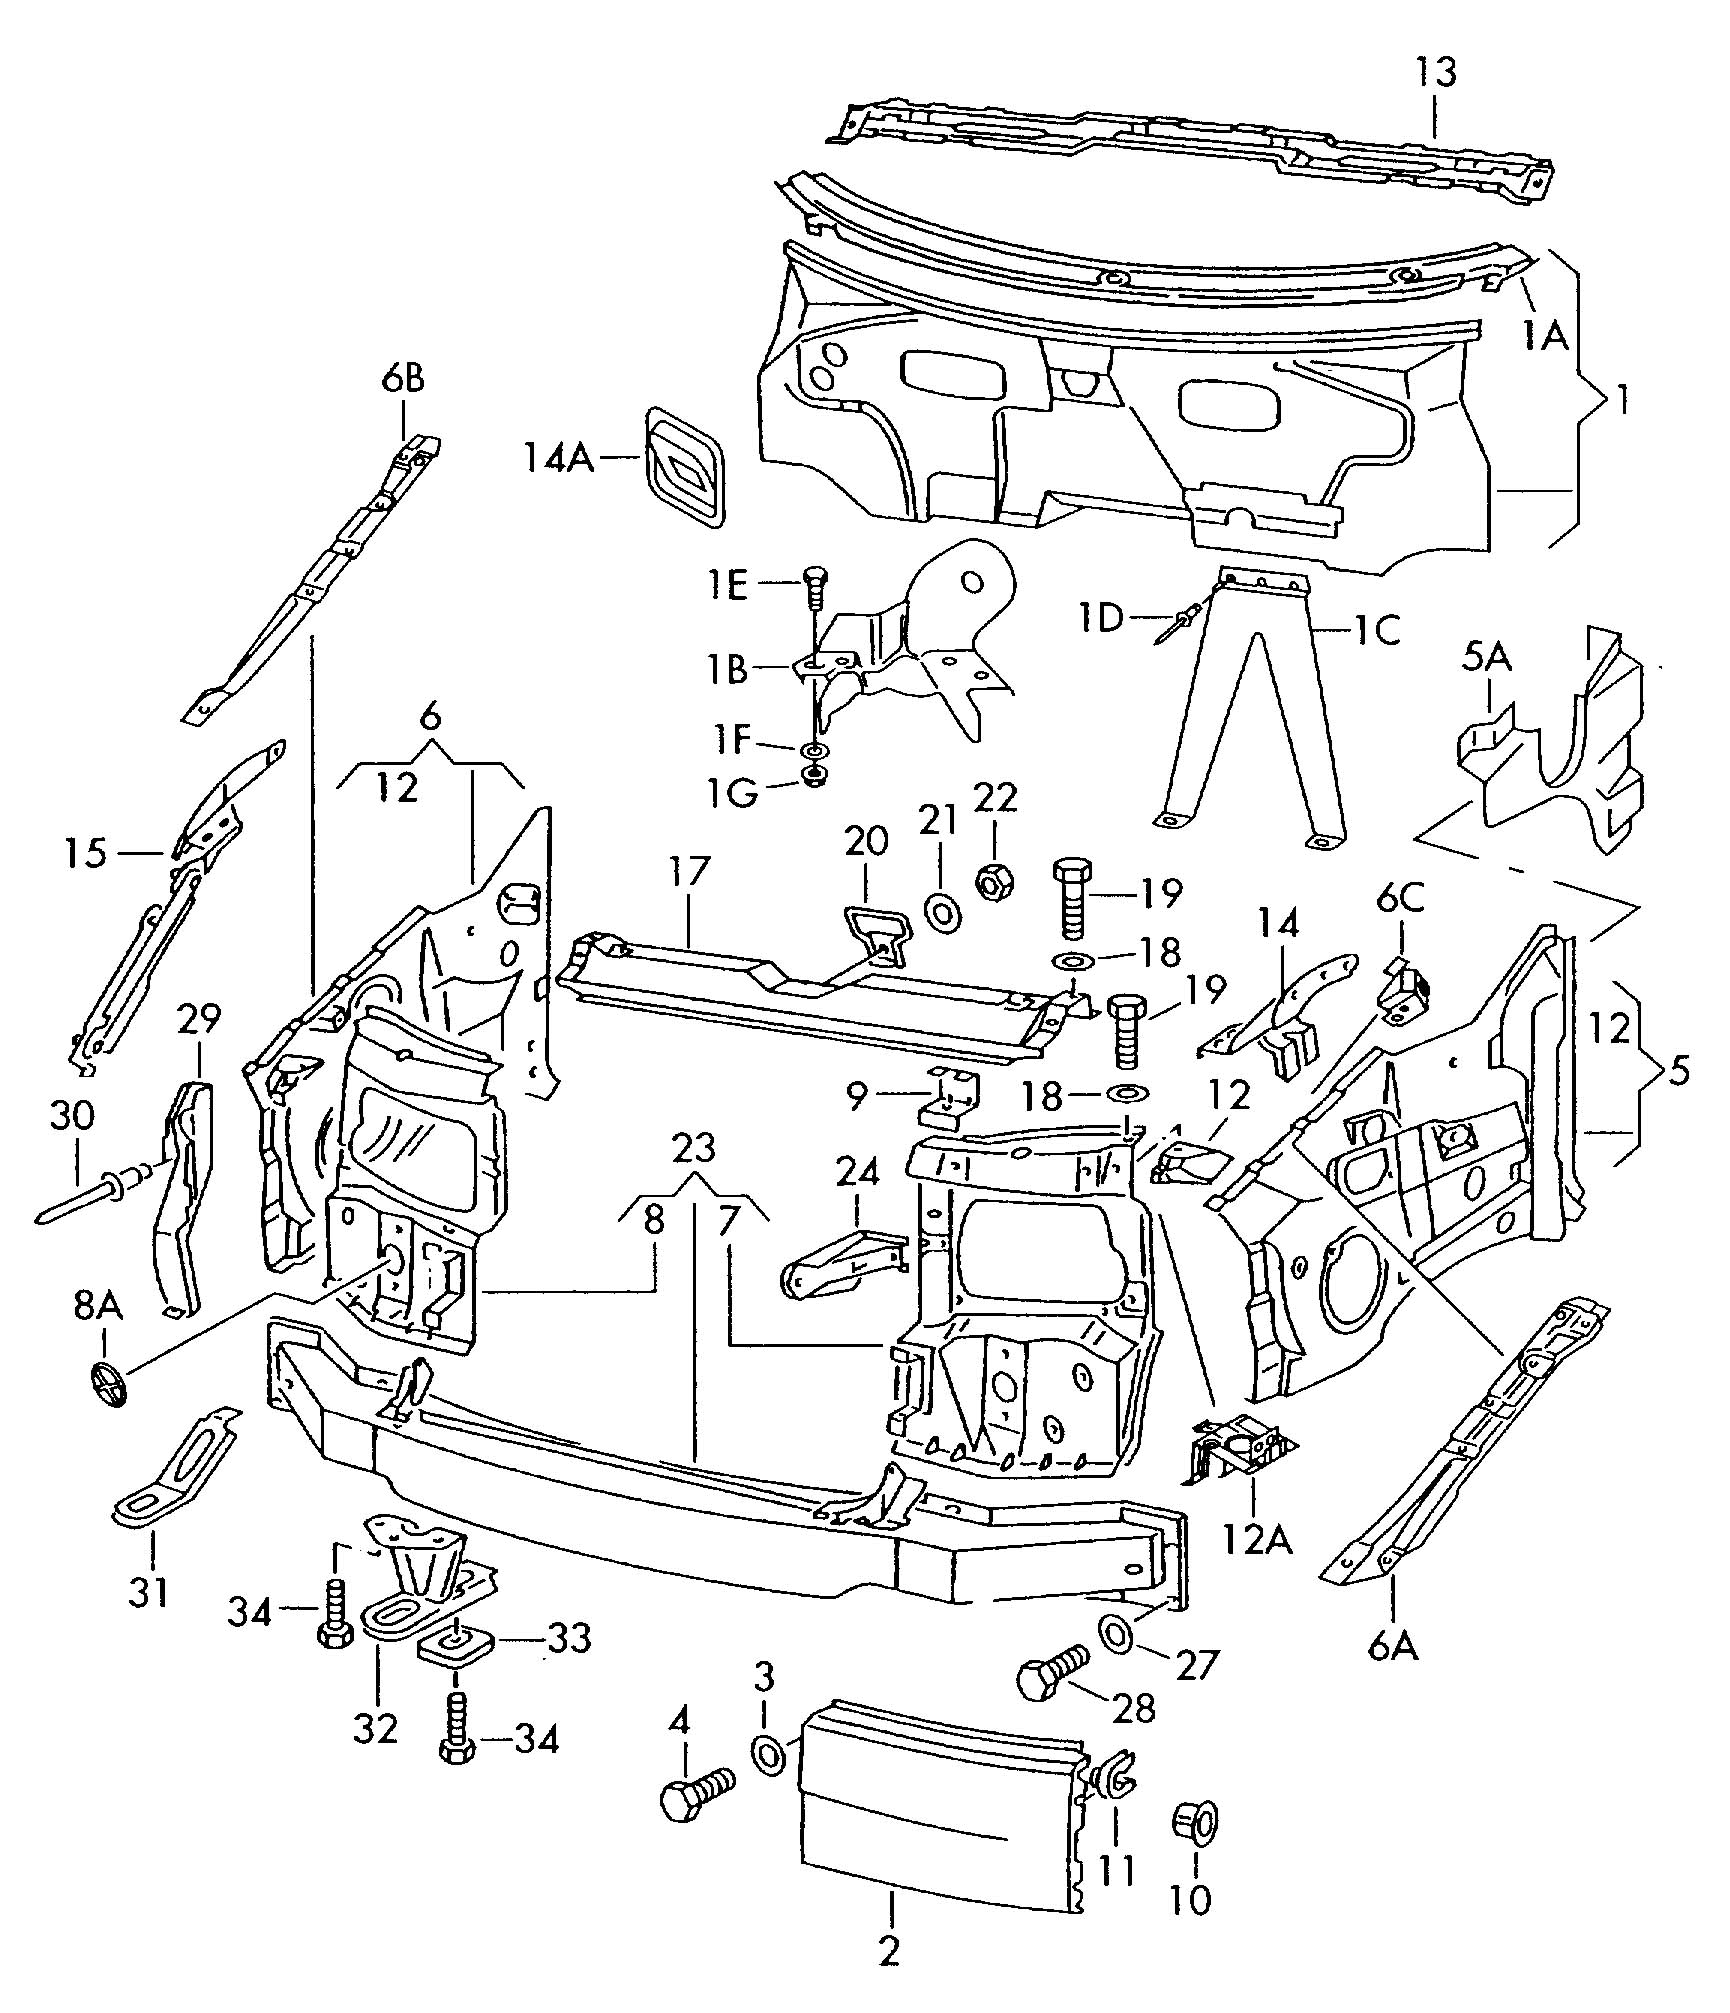 Volkswagen Eurovan Body Front Section Dash Panel